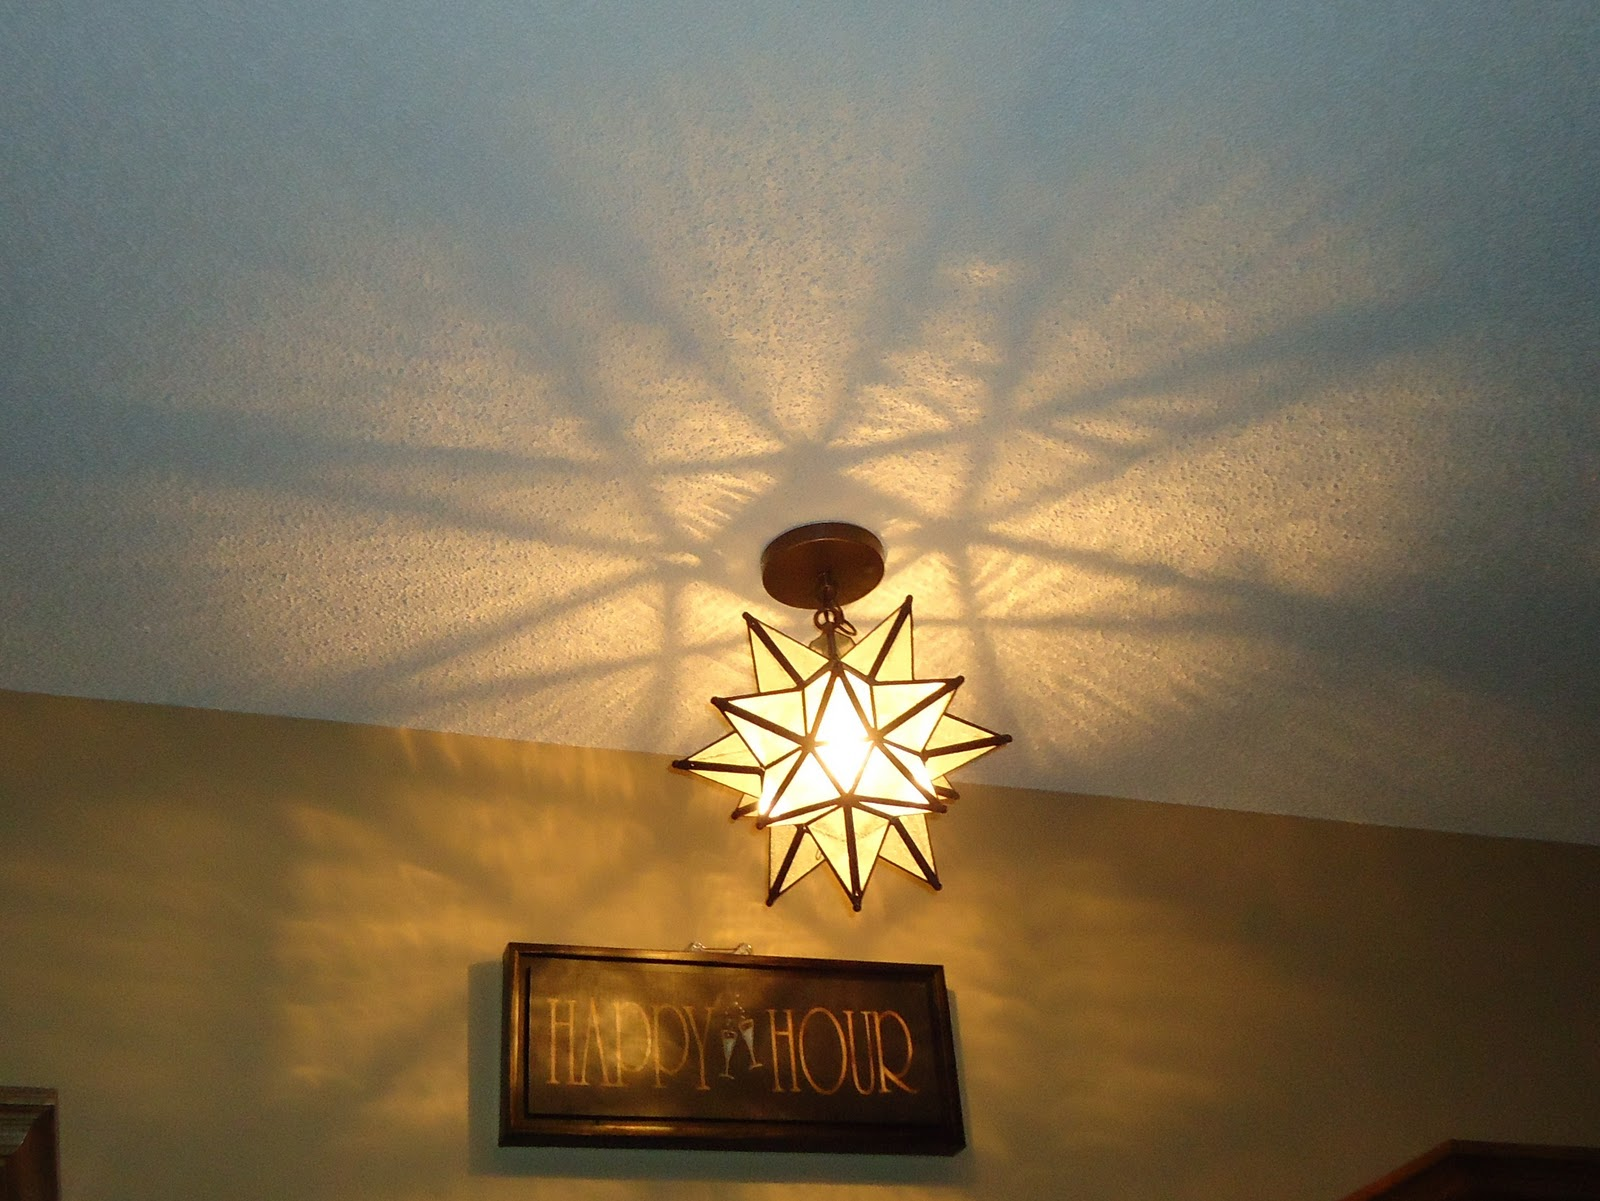 metal lighting lights moravian mason light marvelous hanging jar chandelier large star marvellous pendant